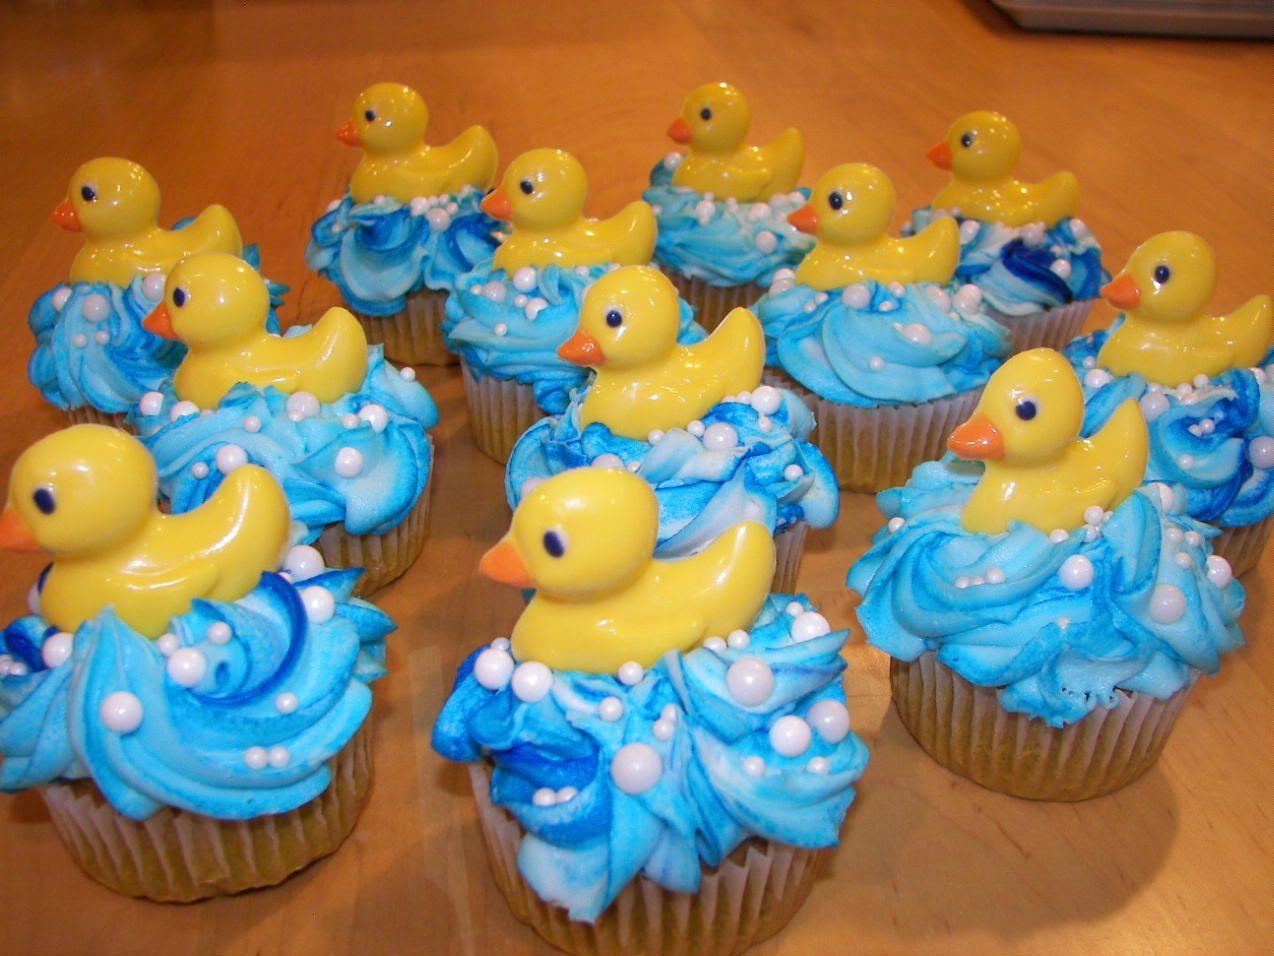 Baby Shower Decor Hobby Lobby ~ Rubber duck baby shower cupcakes rubber duck baby shower